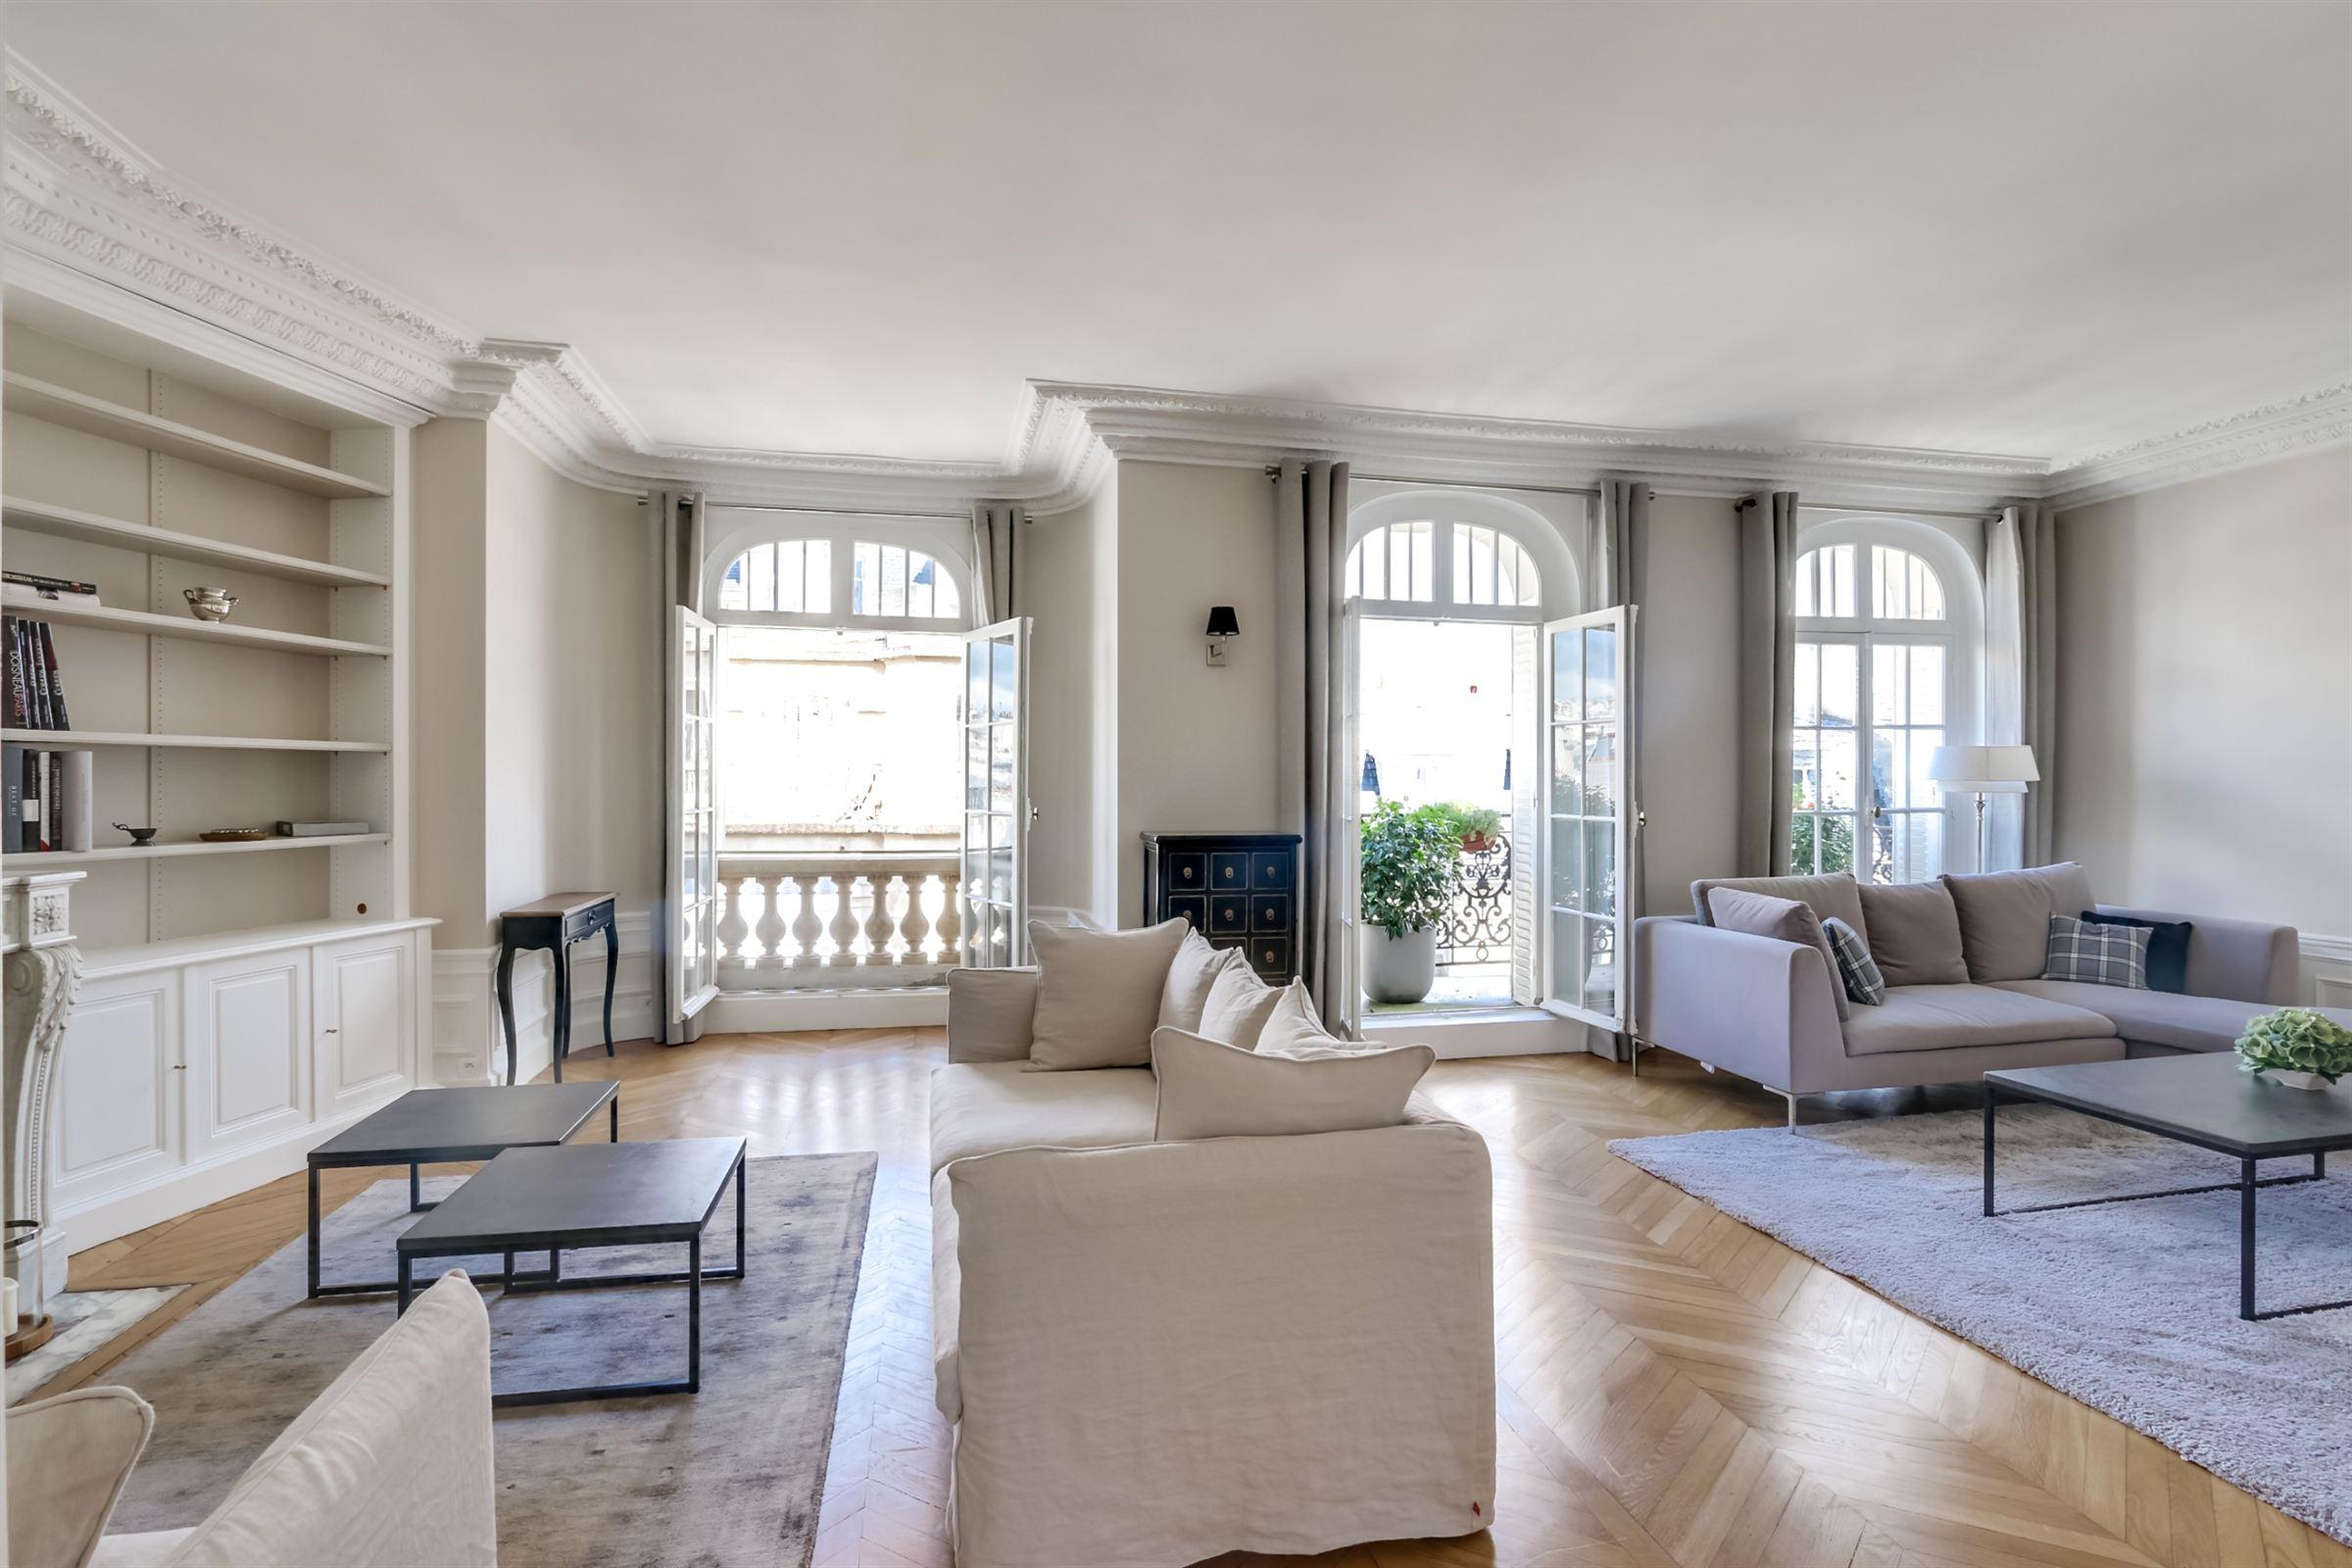 sales property at Apartment for sale - Sole Agent - in Paris 16th - Iéna - Kléber